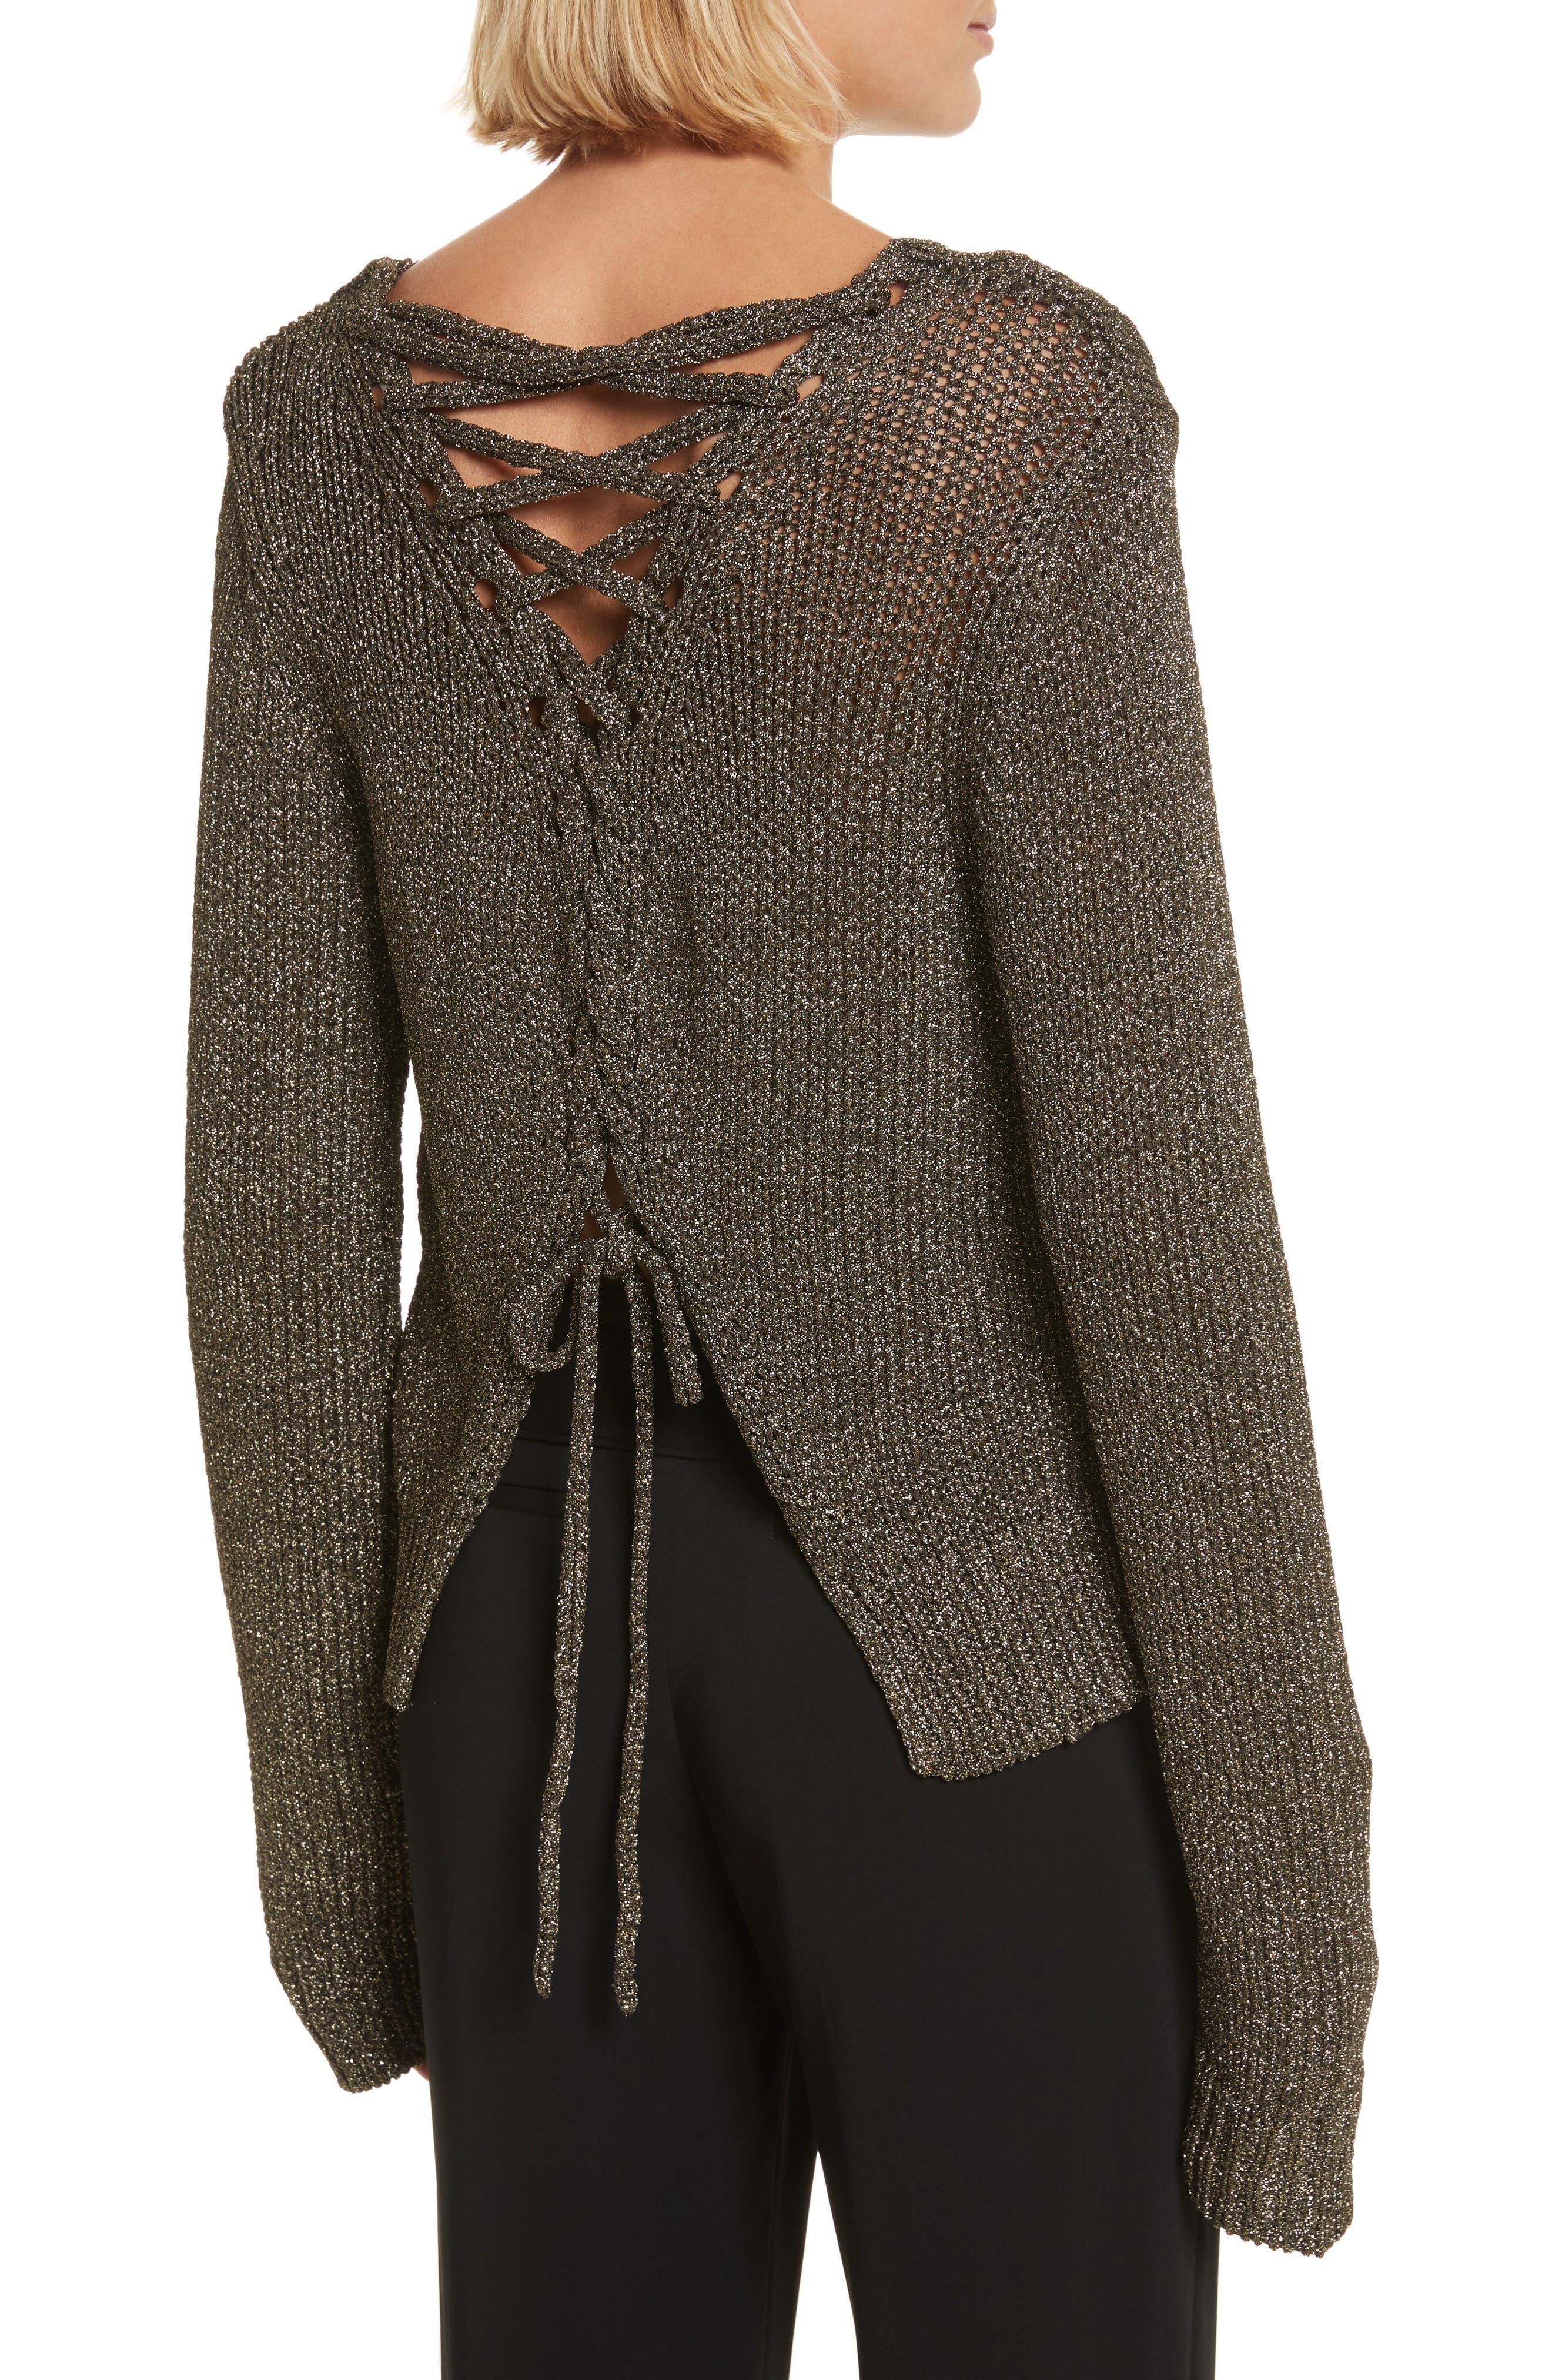 Marjorie Lace-Up Back Sweater,                         Main,                         color, Black/ Gold